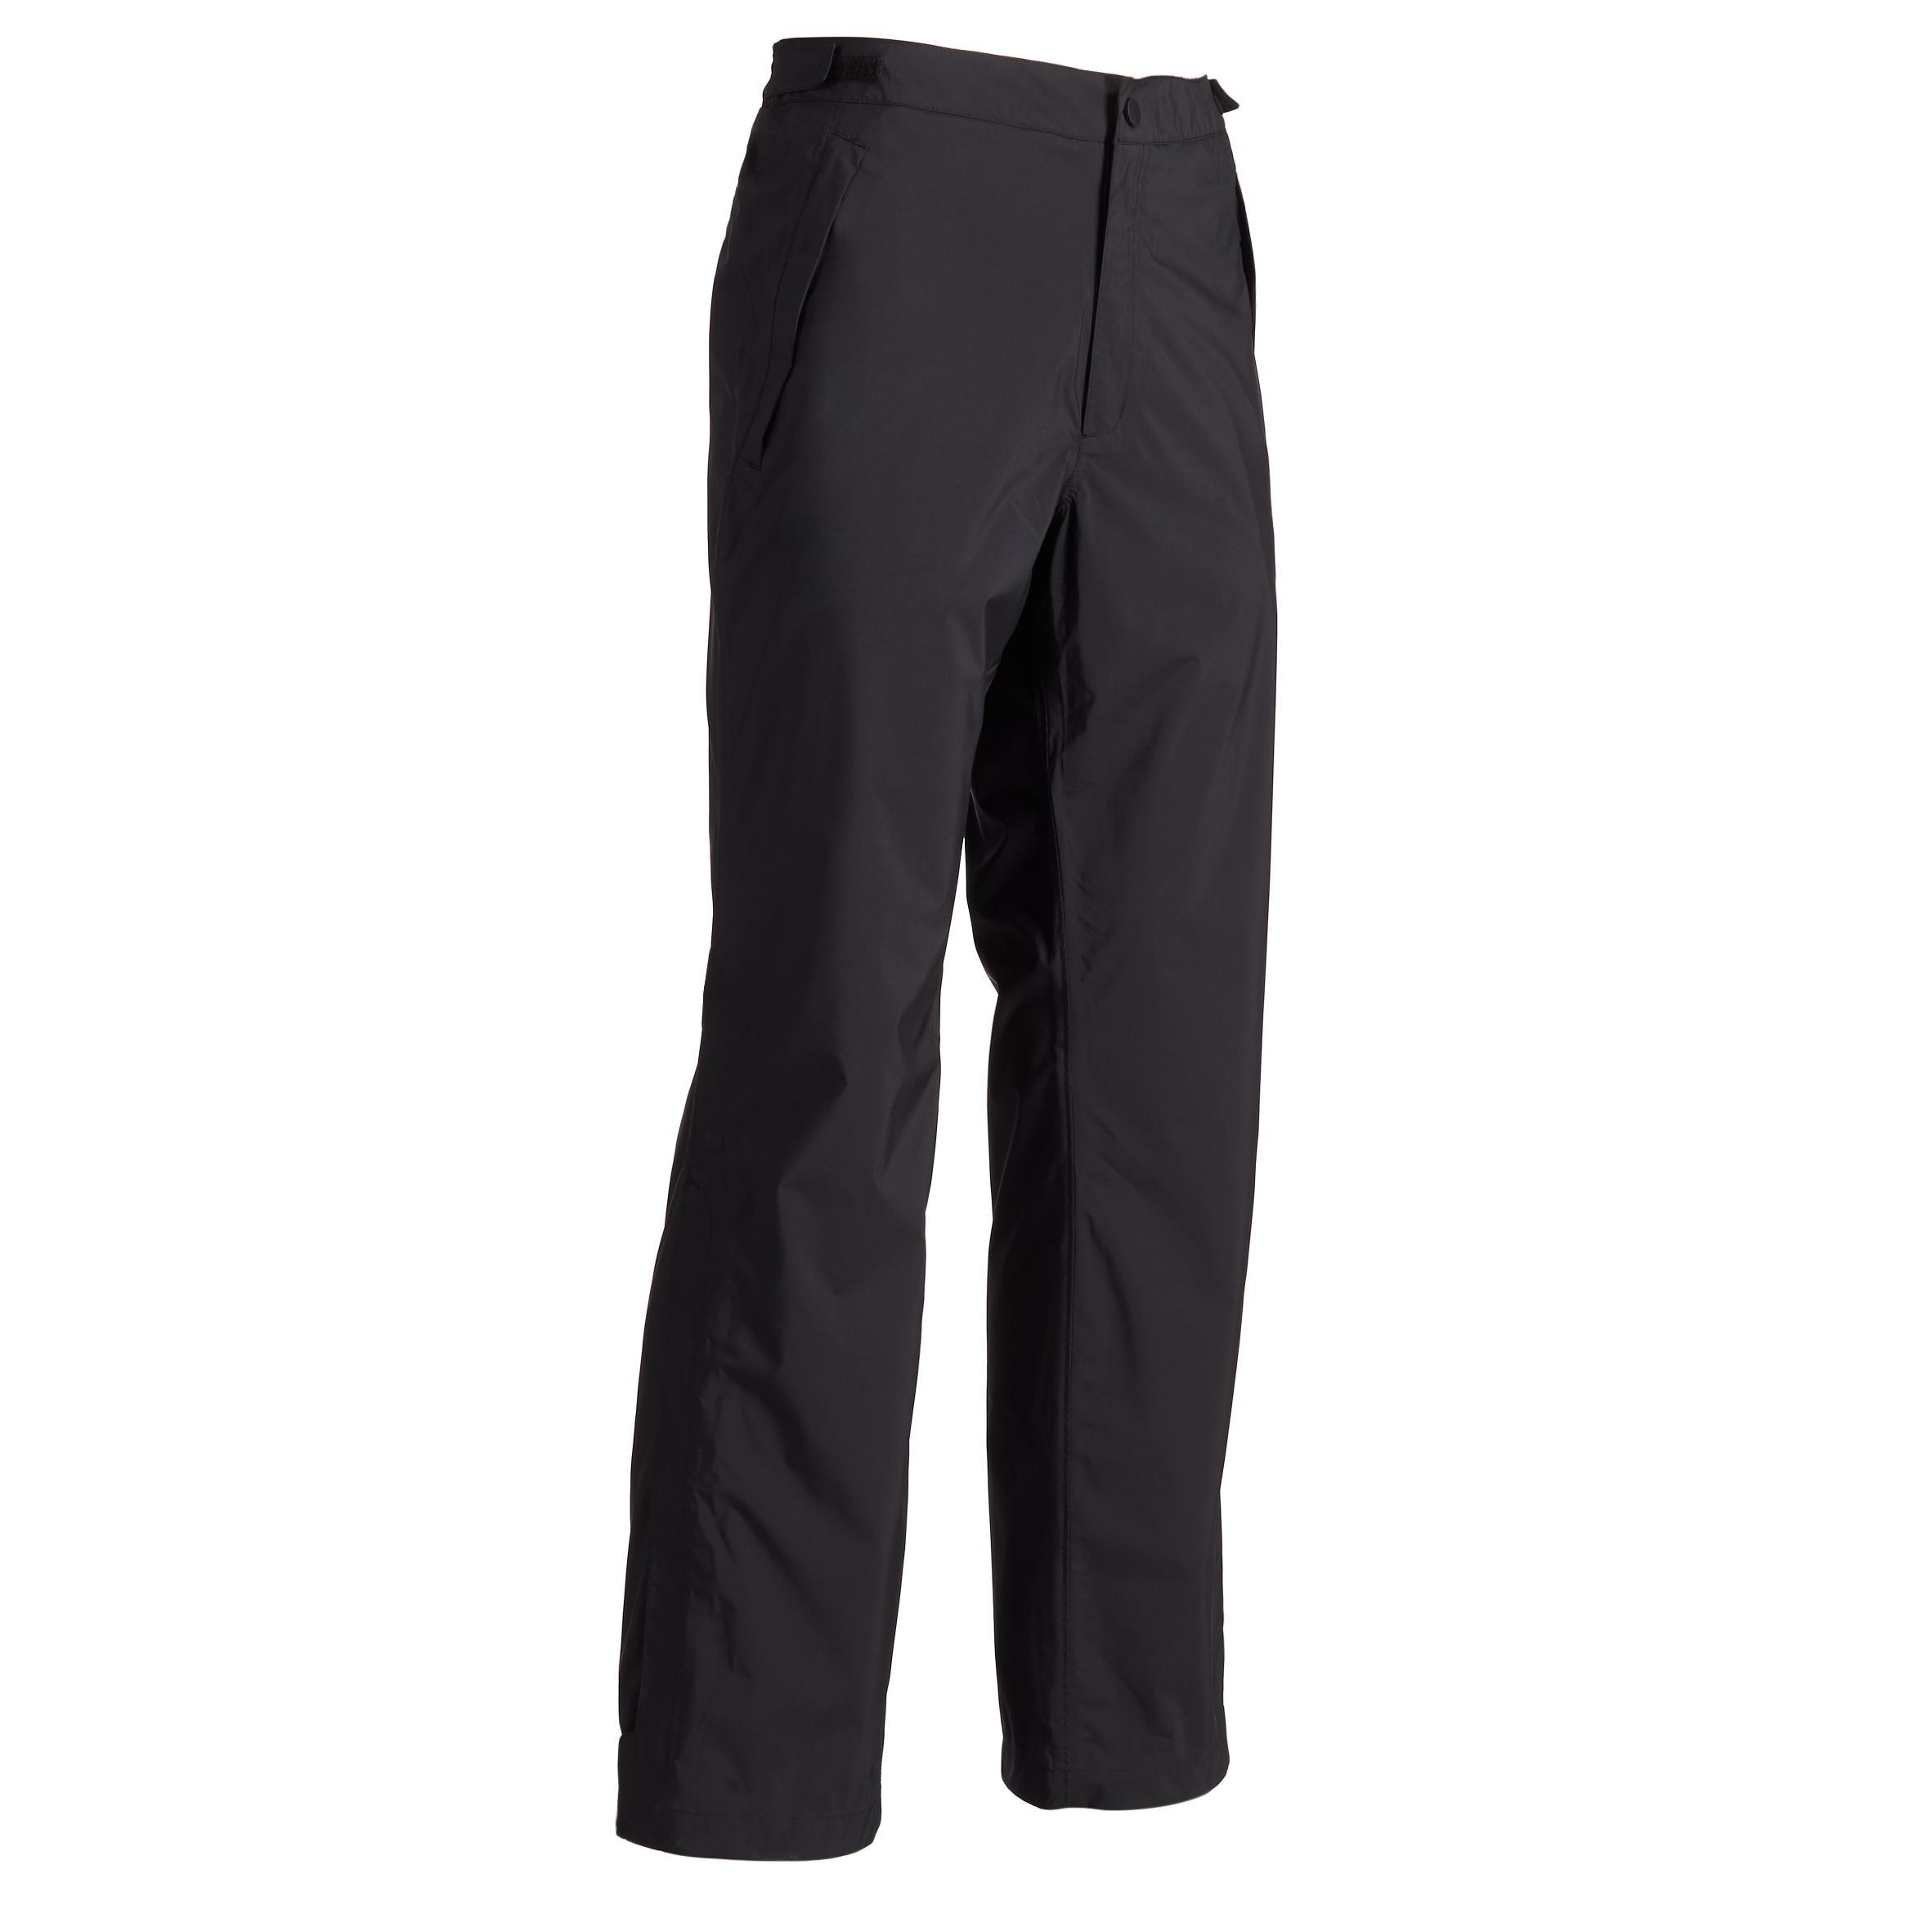 900 Men's Golf Waterproof Rain Top-Layer Pants - Black